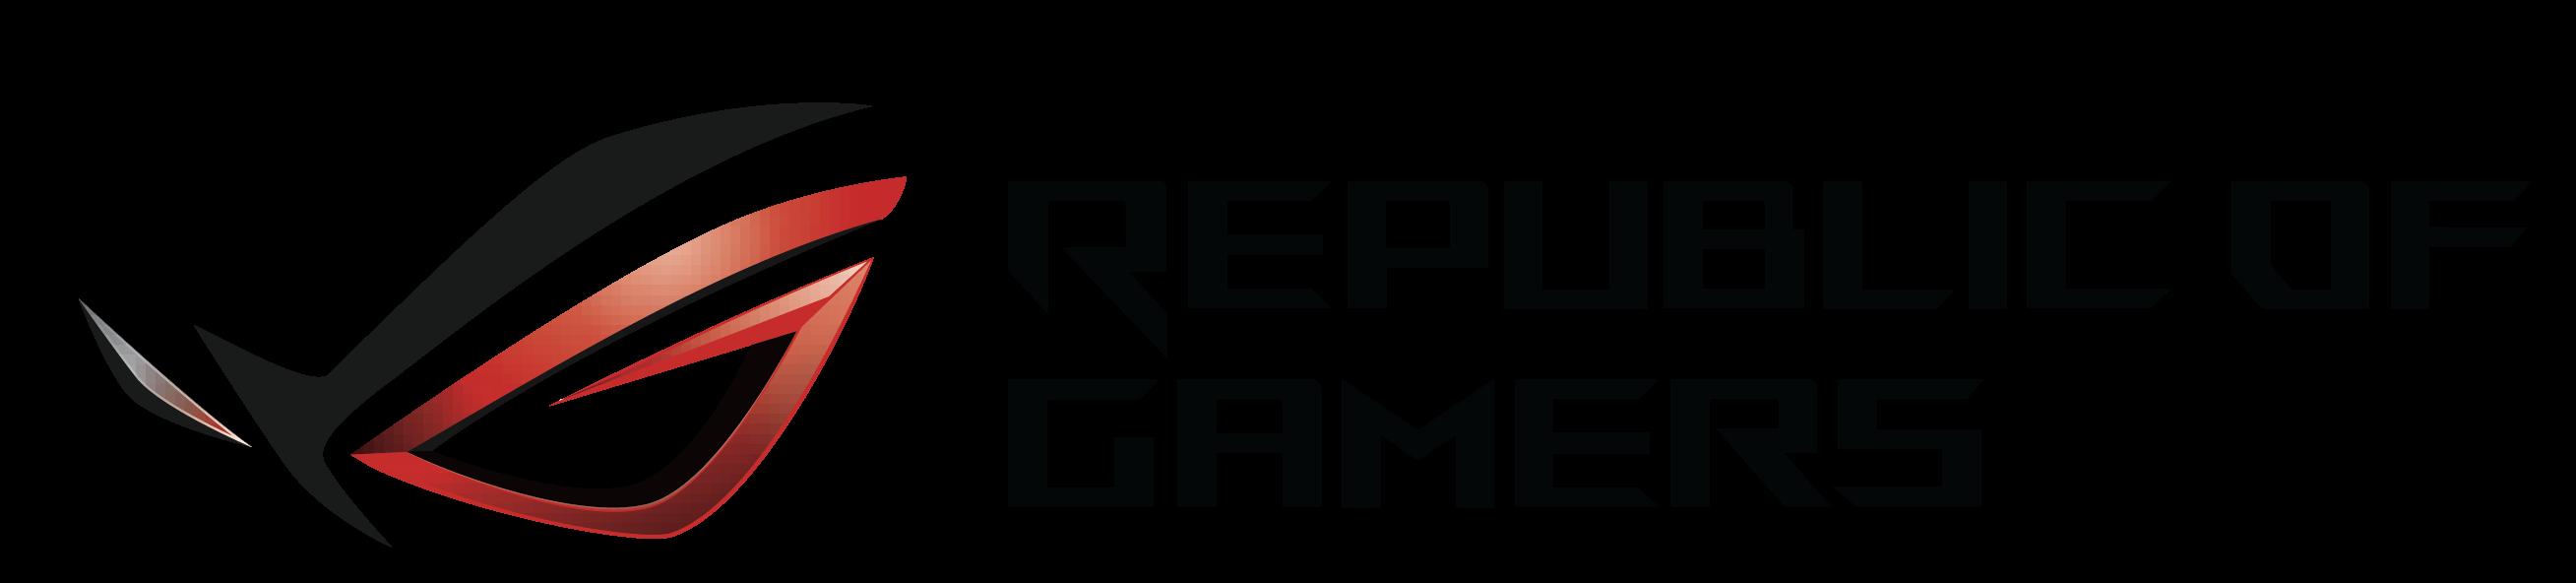 republic of gamers logo